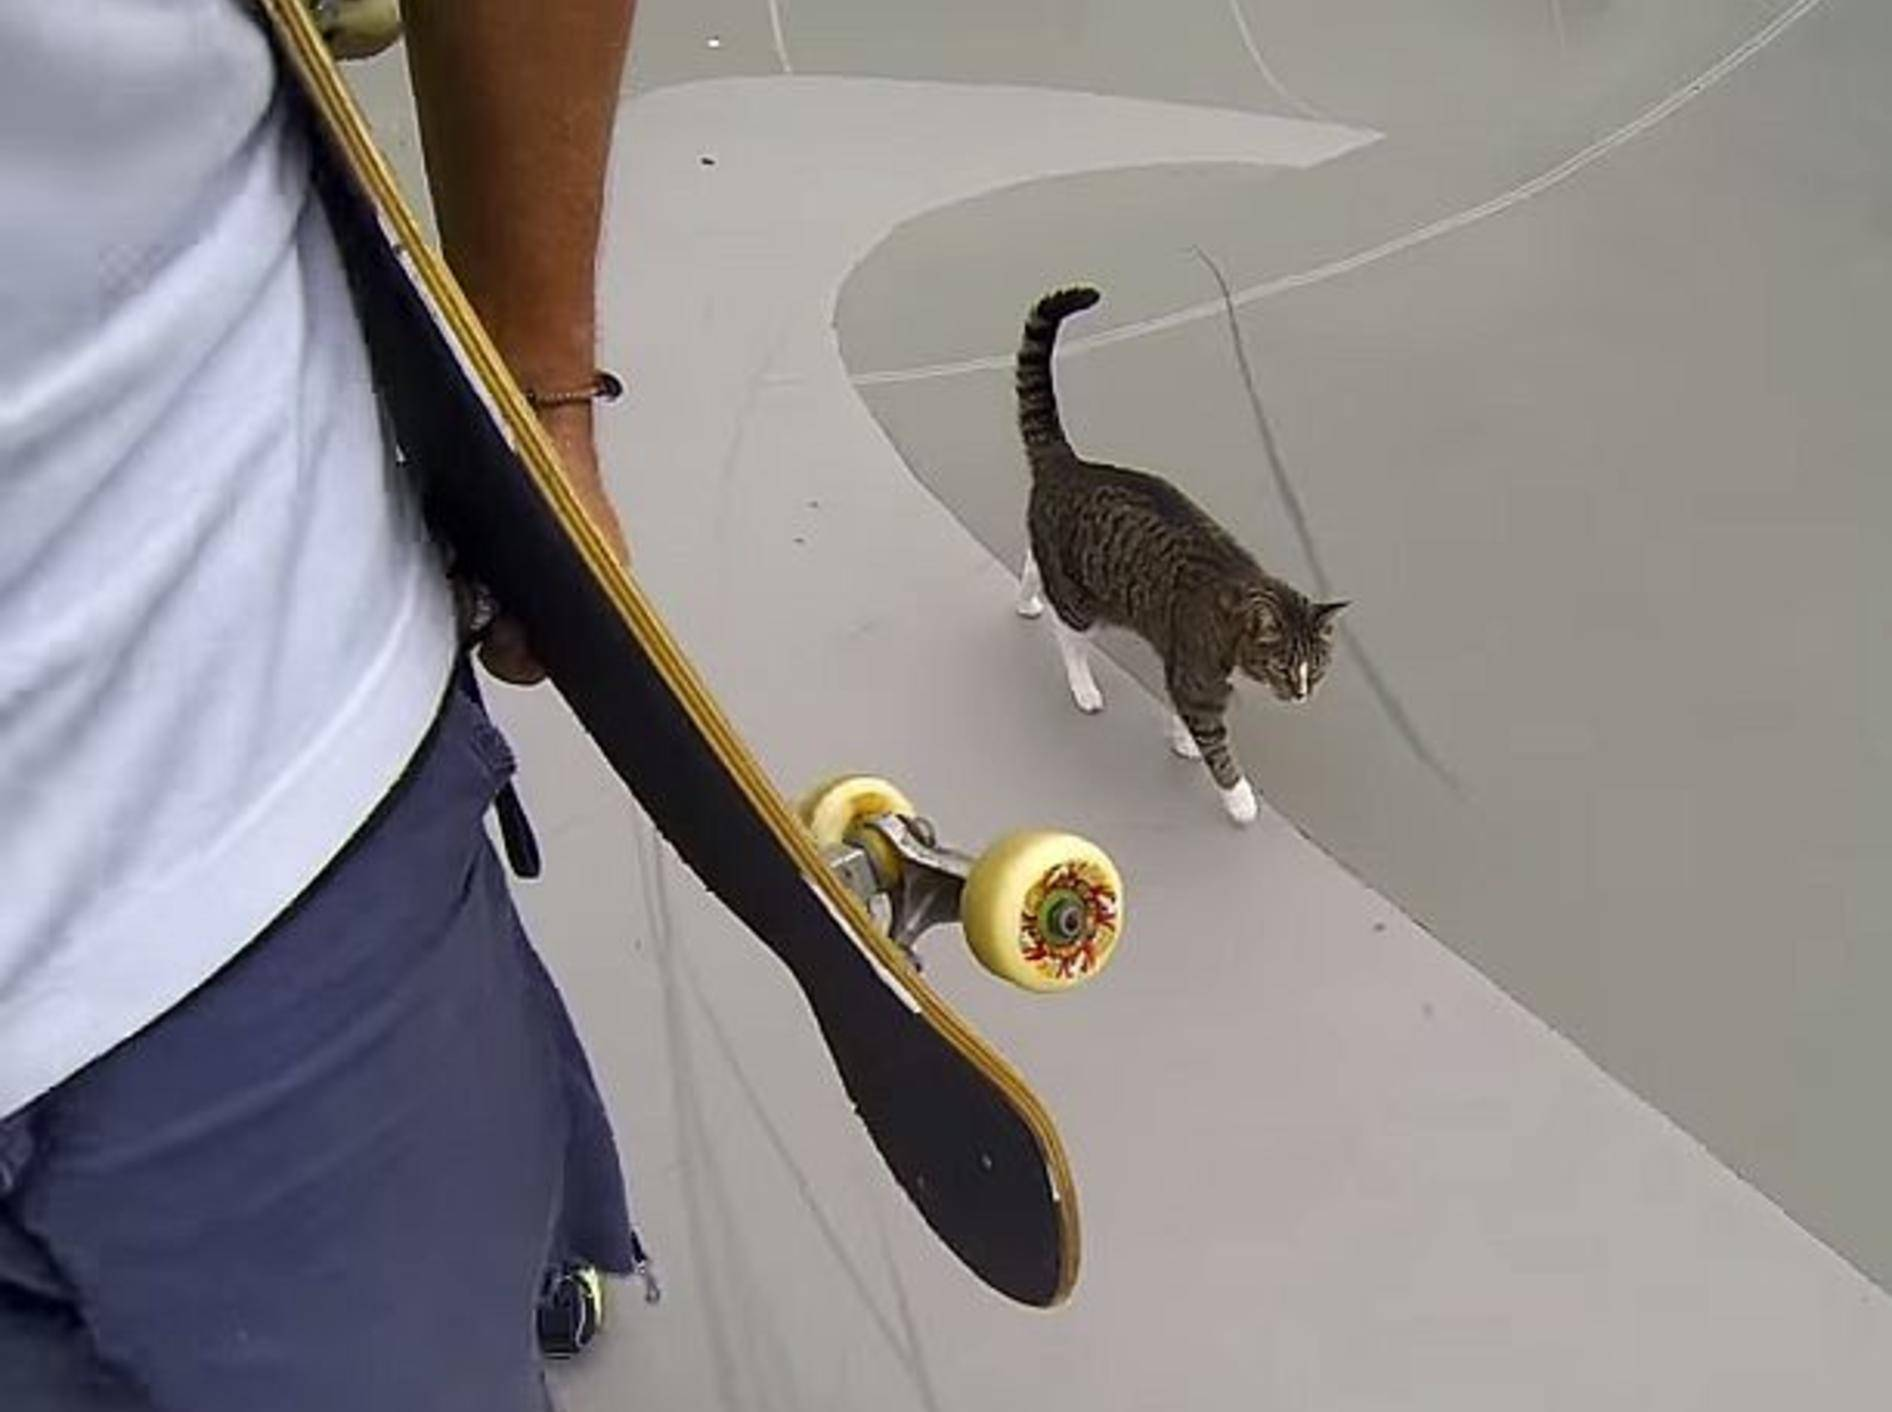 Skateboard-Profi Didga zeigt Tricks im Skatepark – Bild: Youtube / GoPro